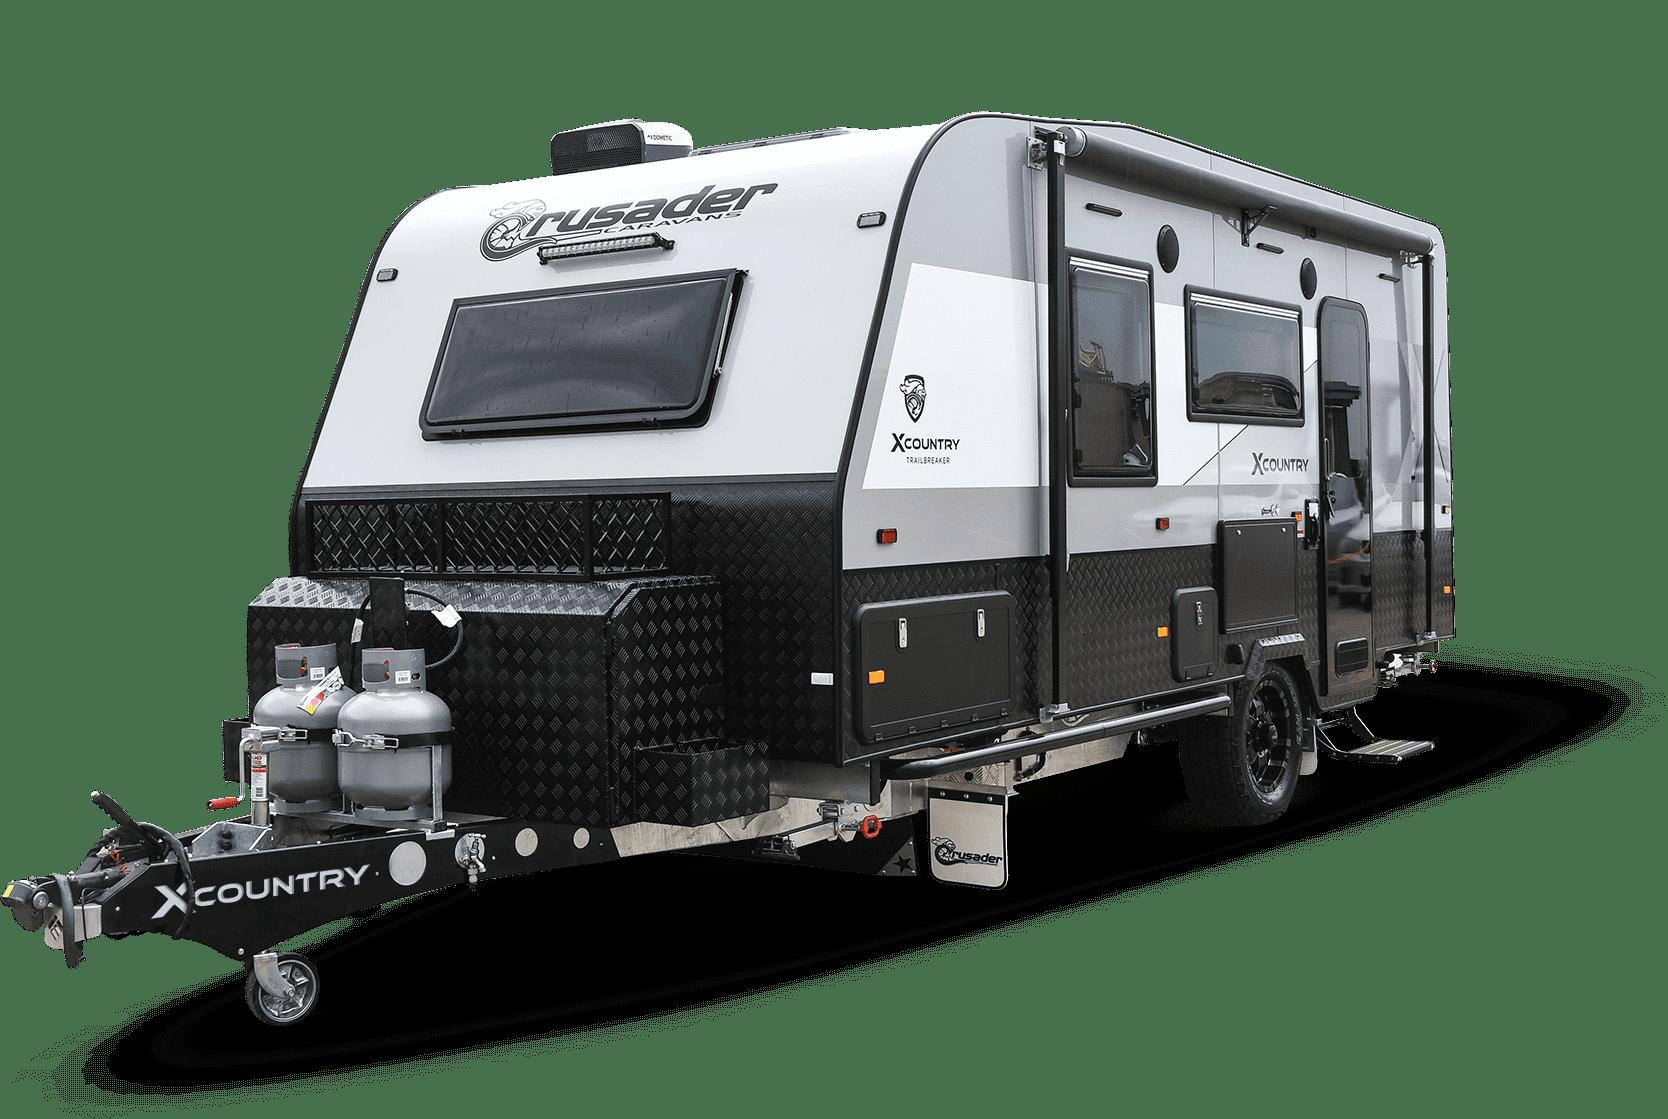 Image of new caravan for sale Crusader XC Trailbreaker.